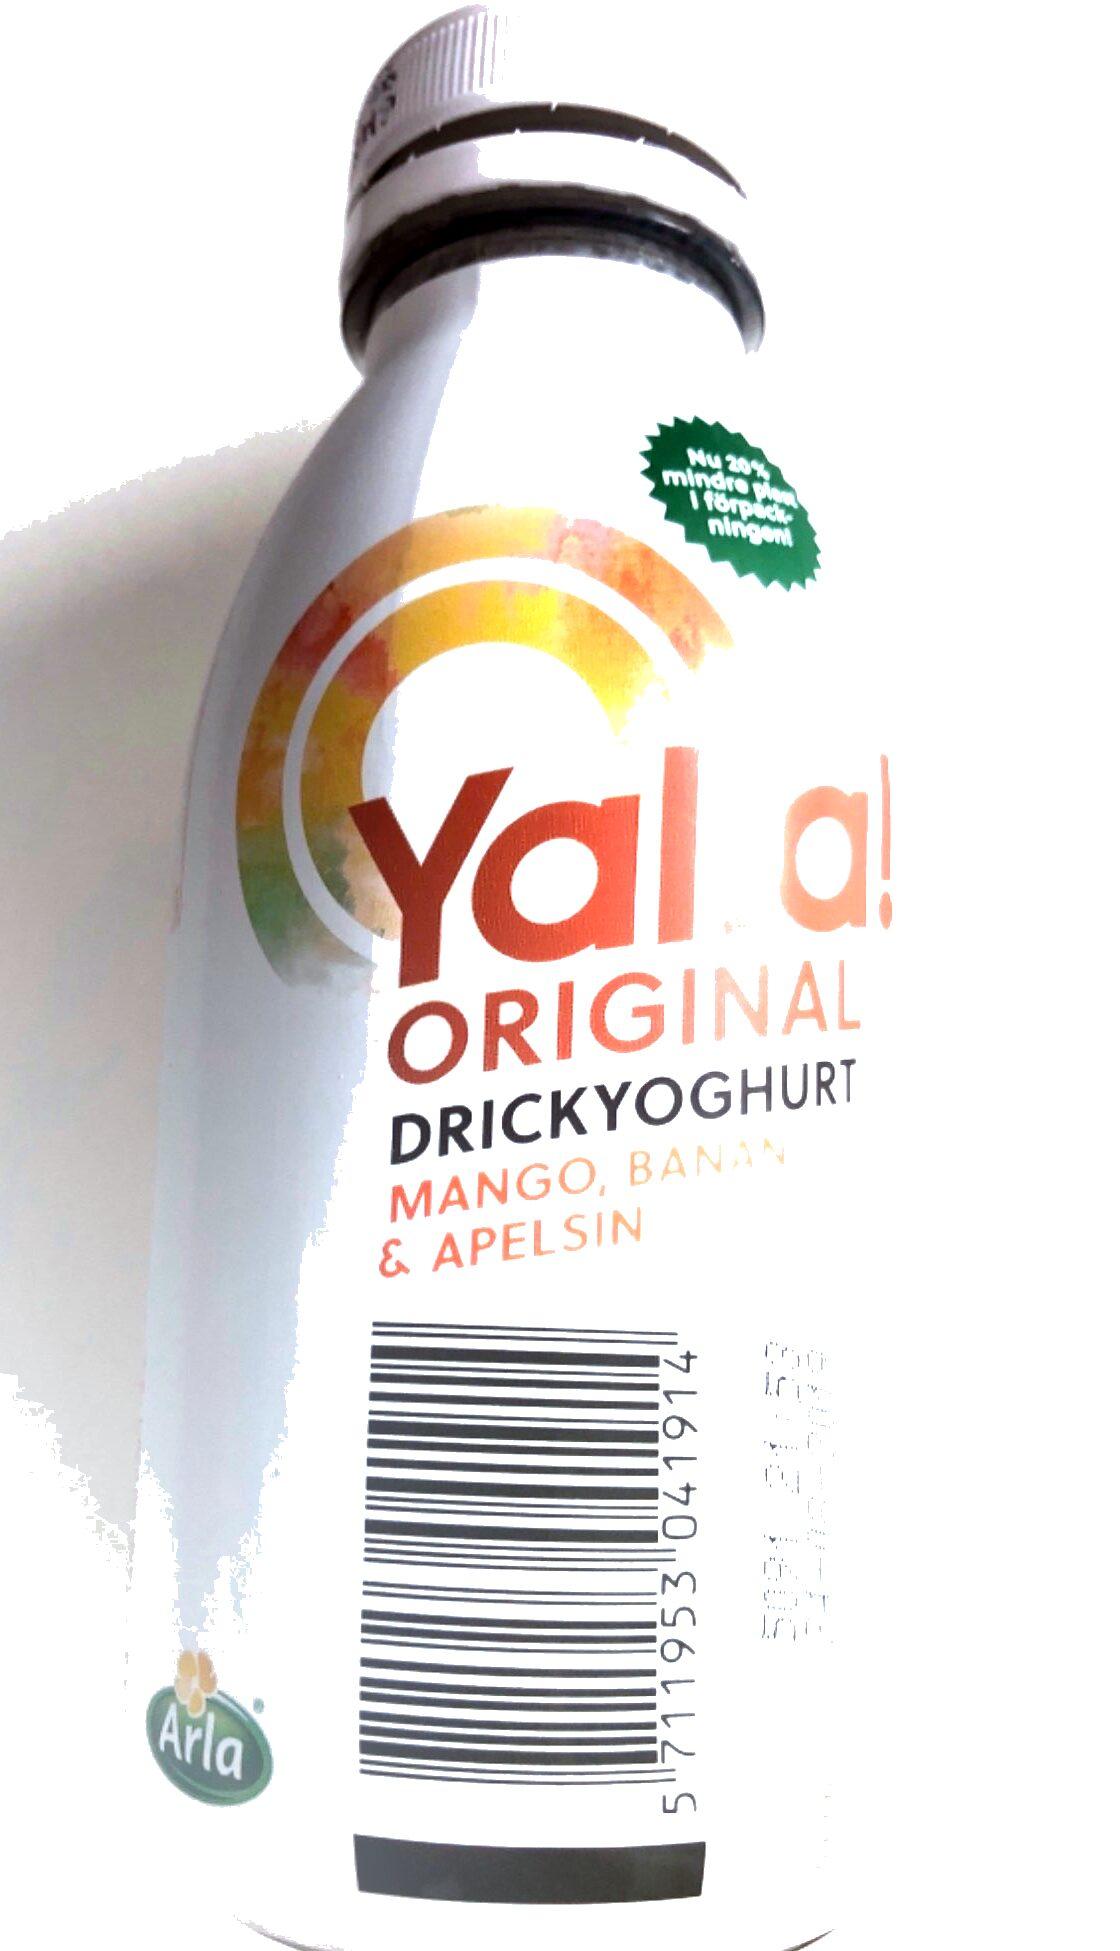 Yalla original drickyoghurt mango, banan & apelsin - Product - sv